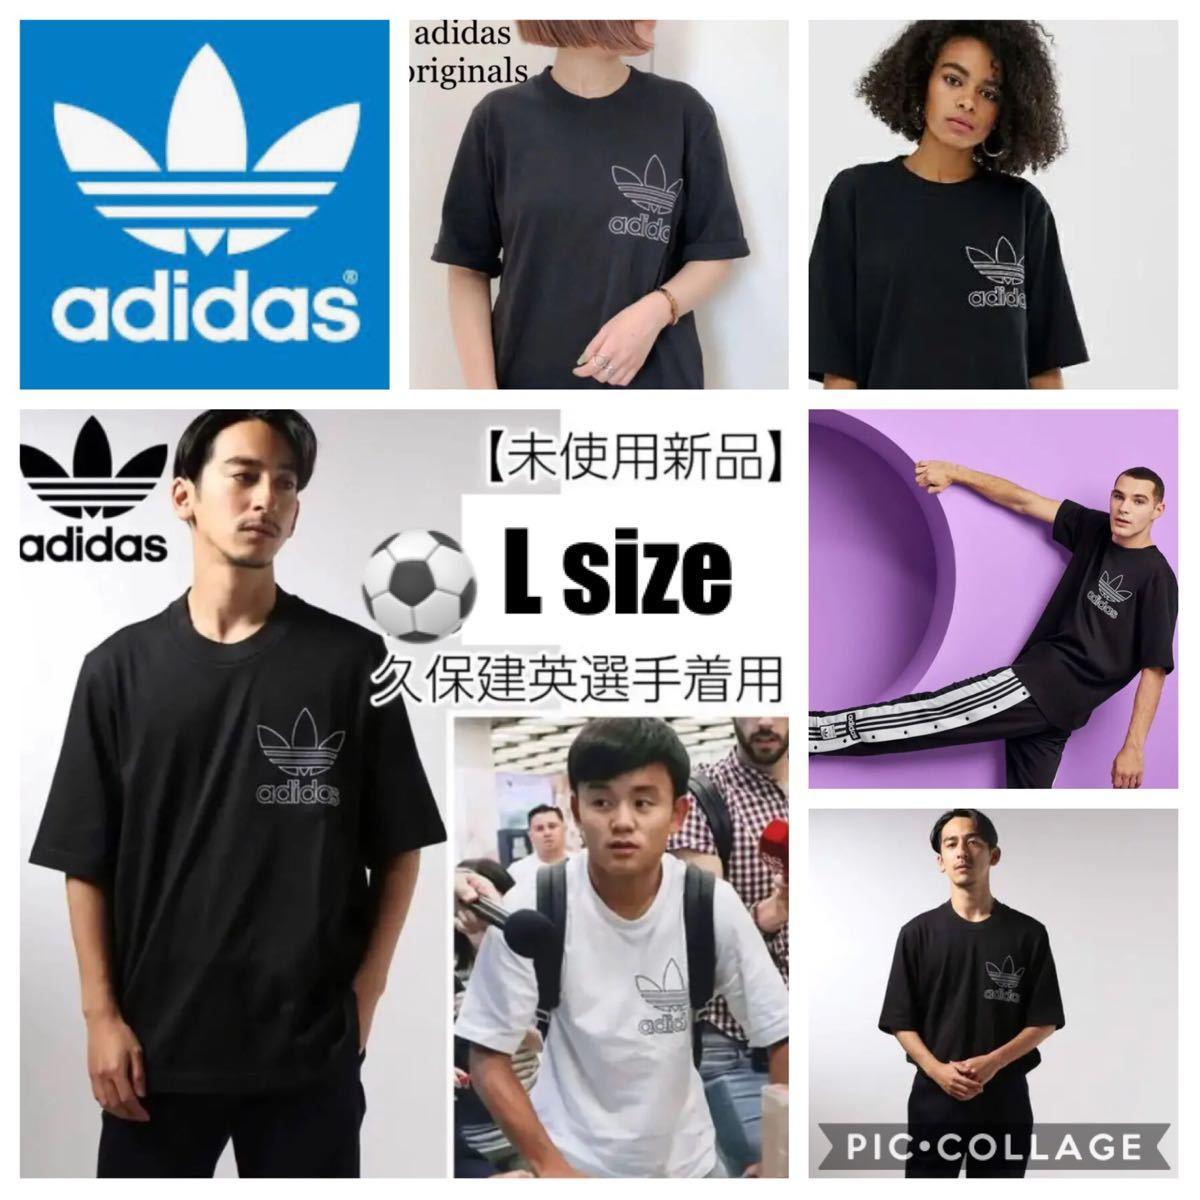 adidas tシャツ アディダス オリジナルス アウトライン ビッグTシャツ